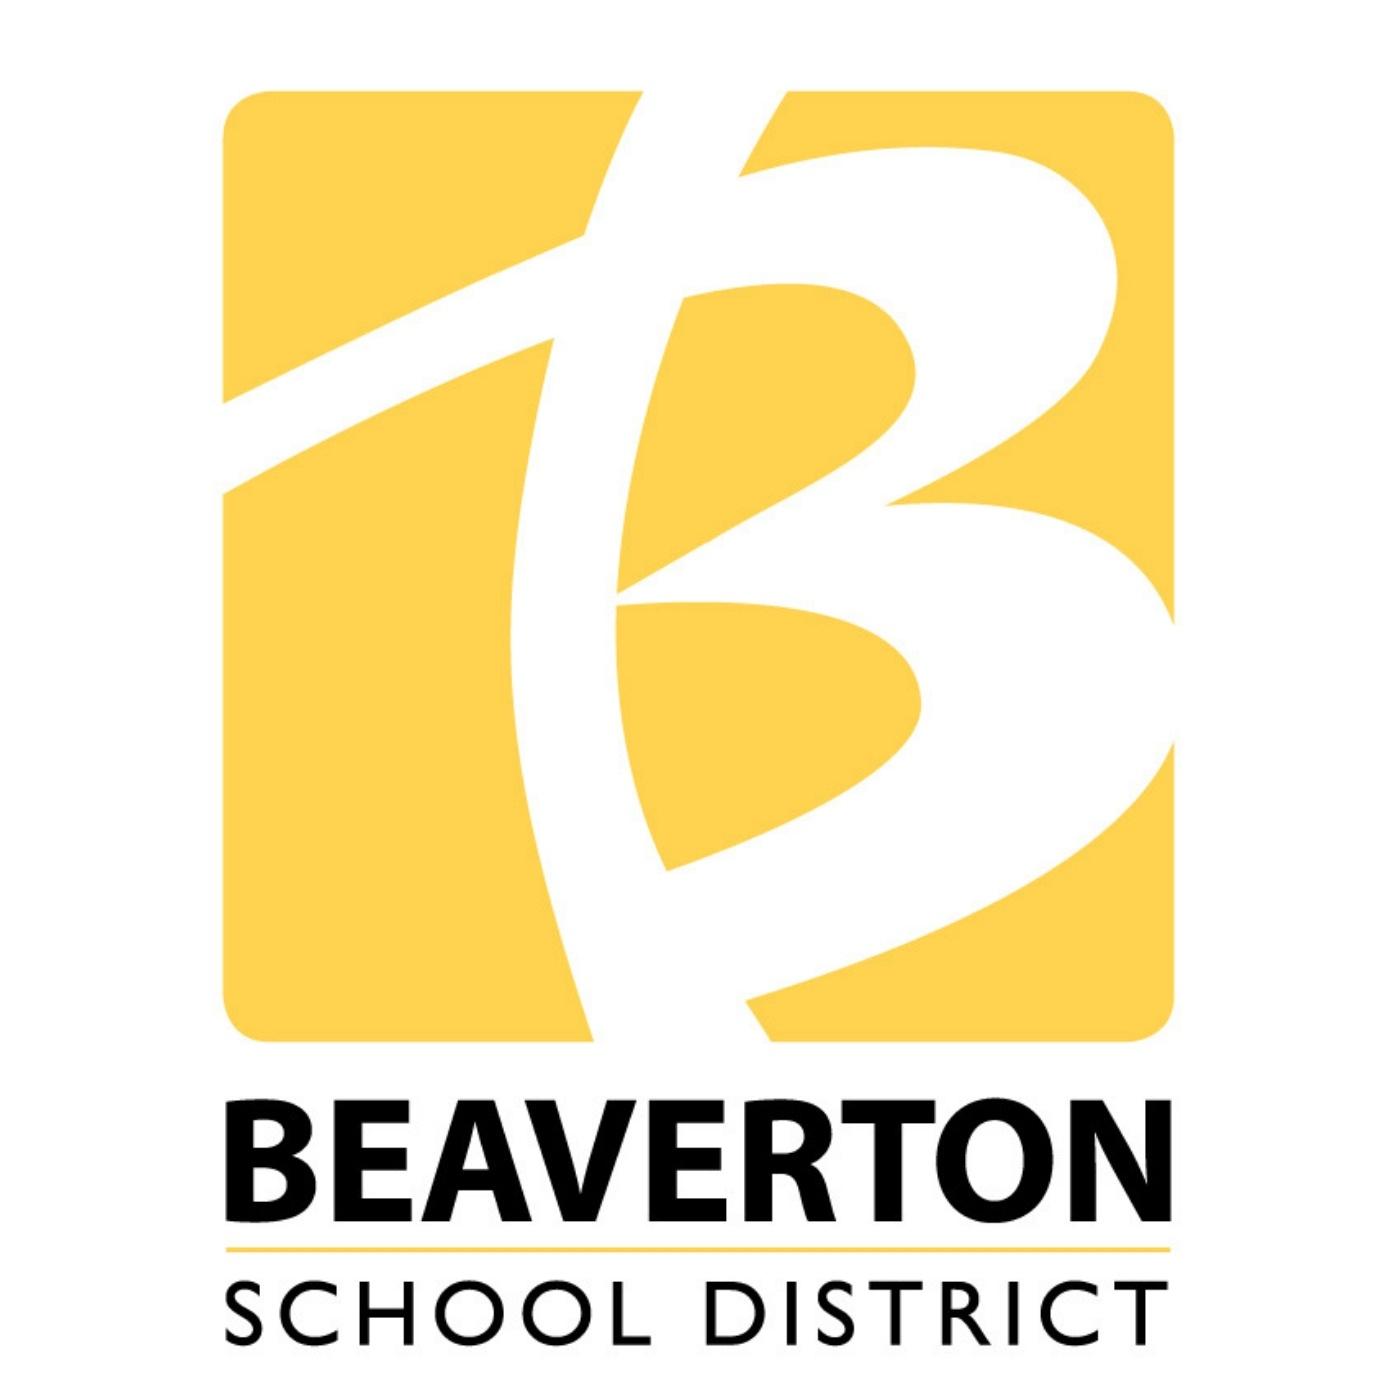 Beaverton school district logo